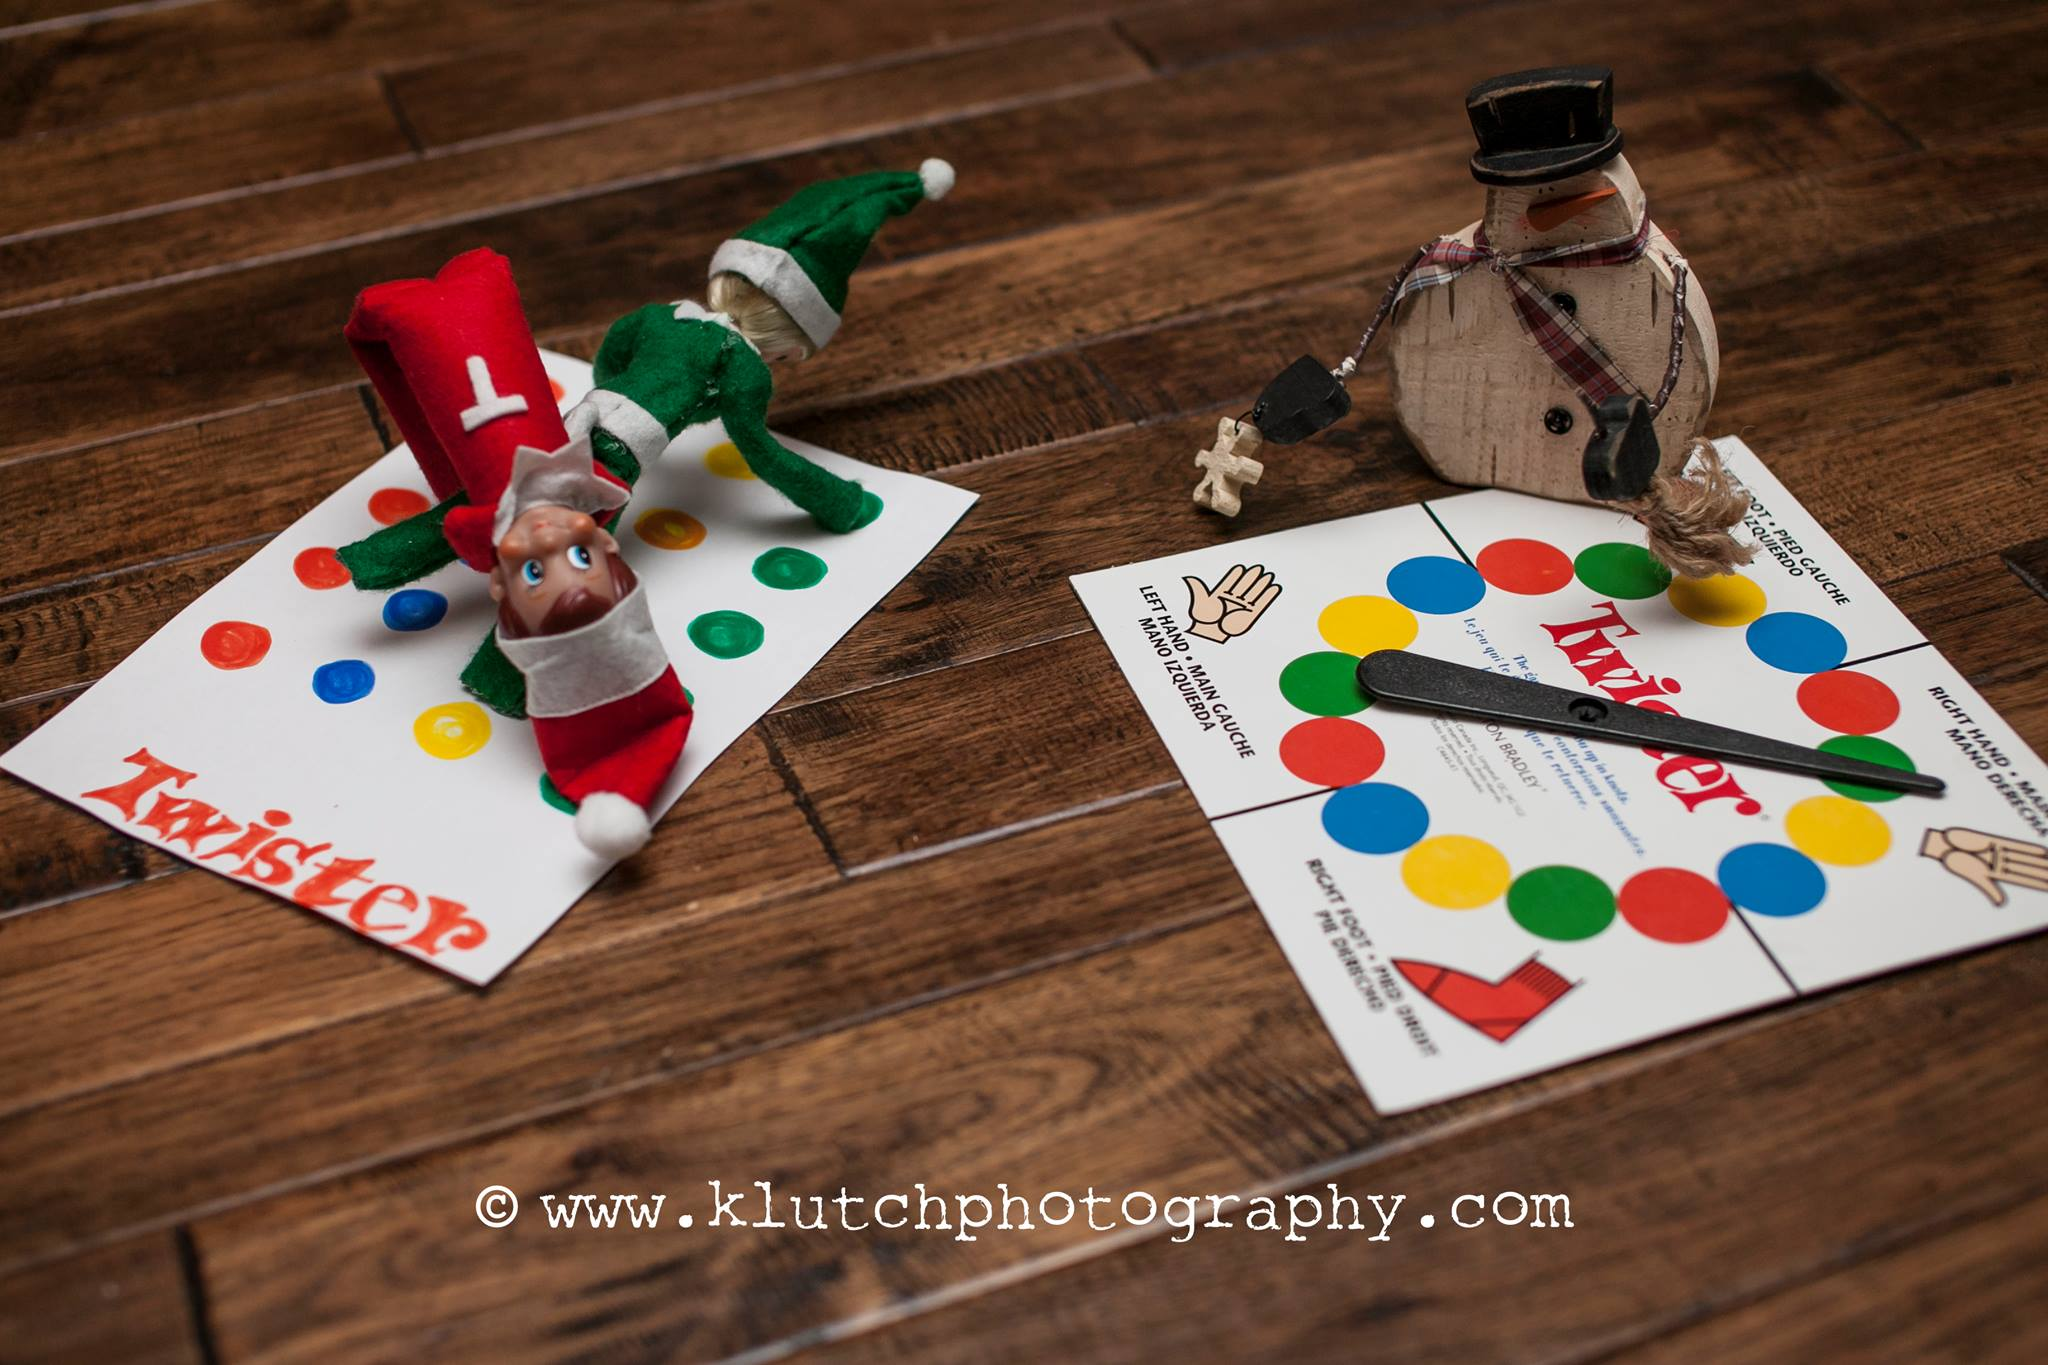 Klutch Photography, family photographer, elf on the shelf, vancouver family photographer, whiterock family photographer, lifeunscripted photographer, lifestlye photographer k.jpg